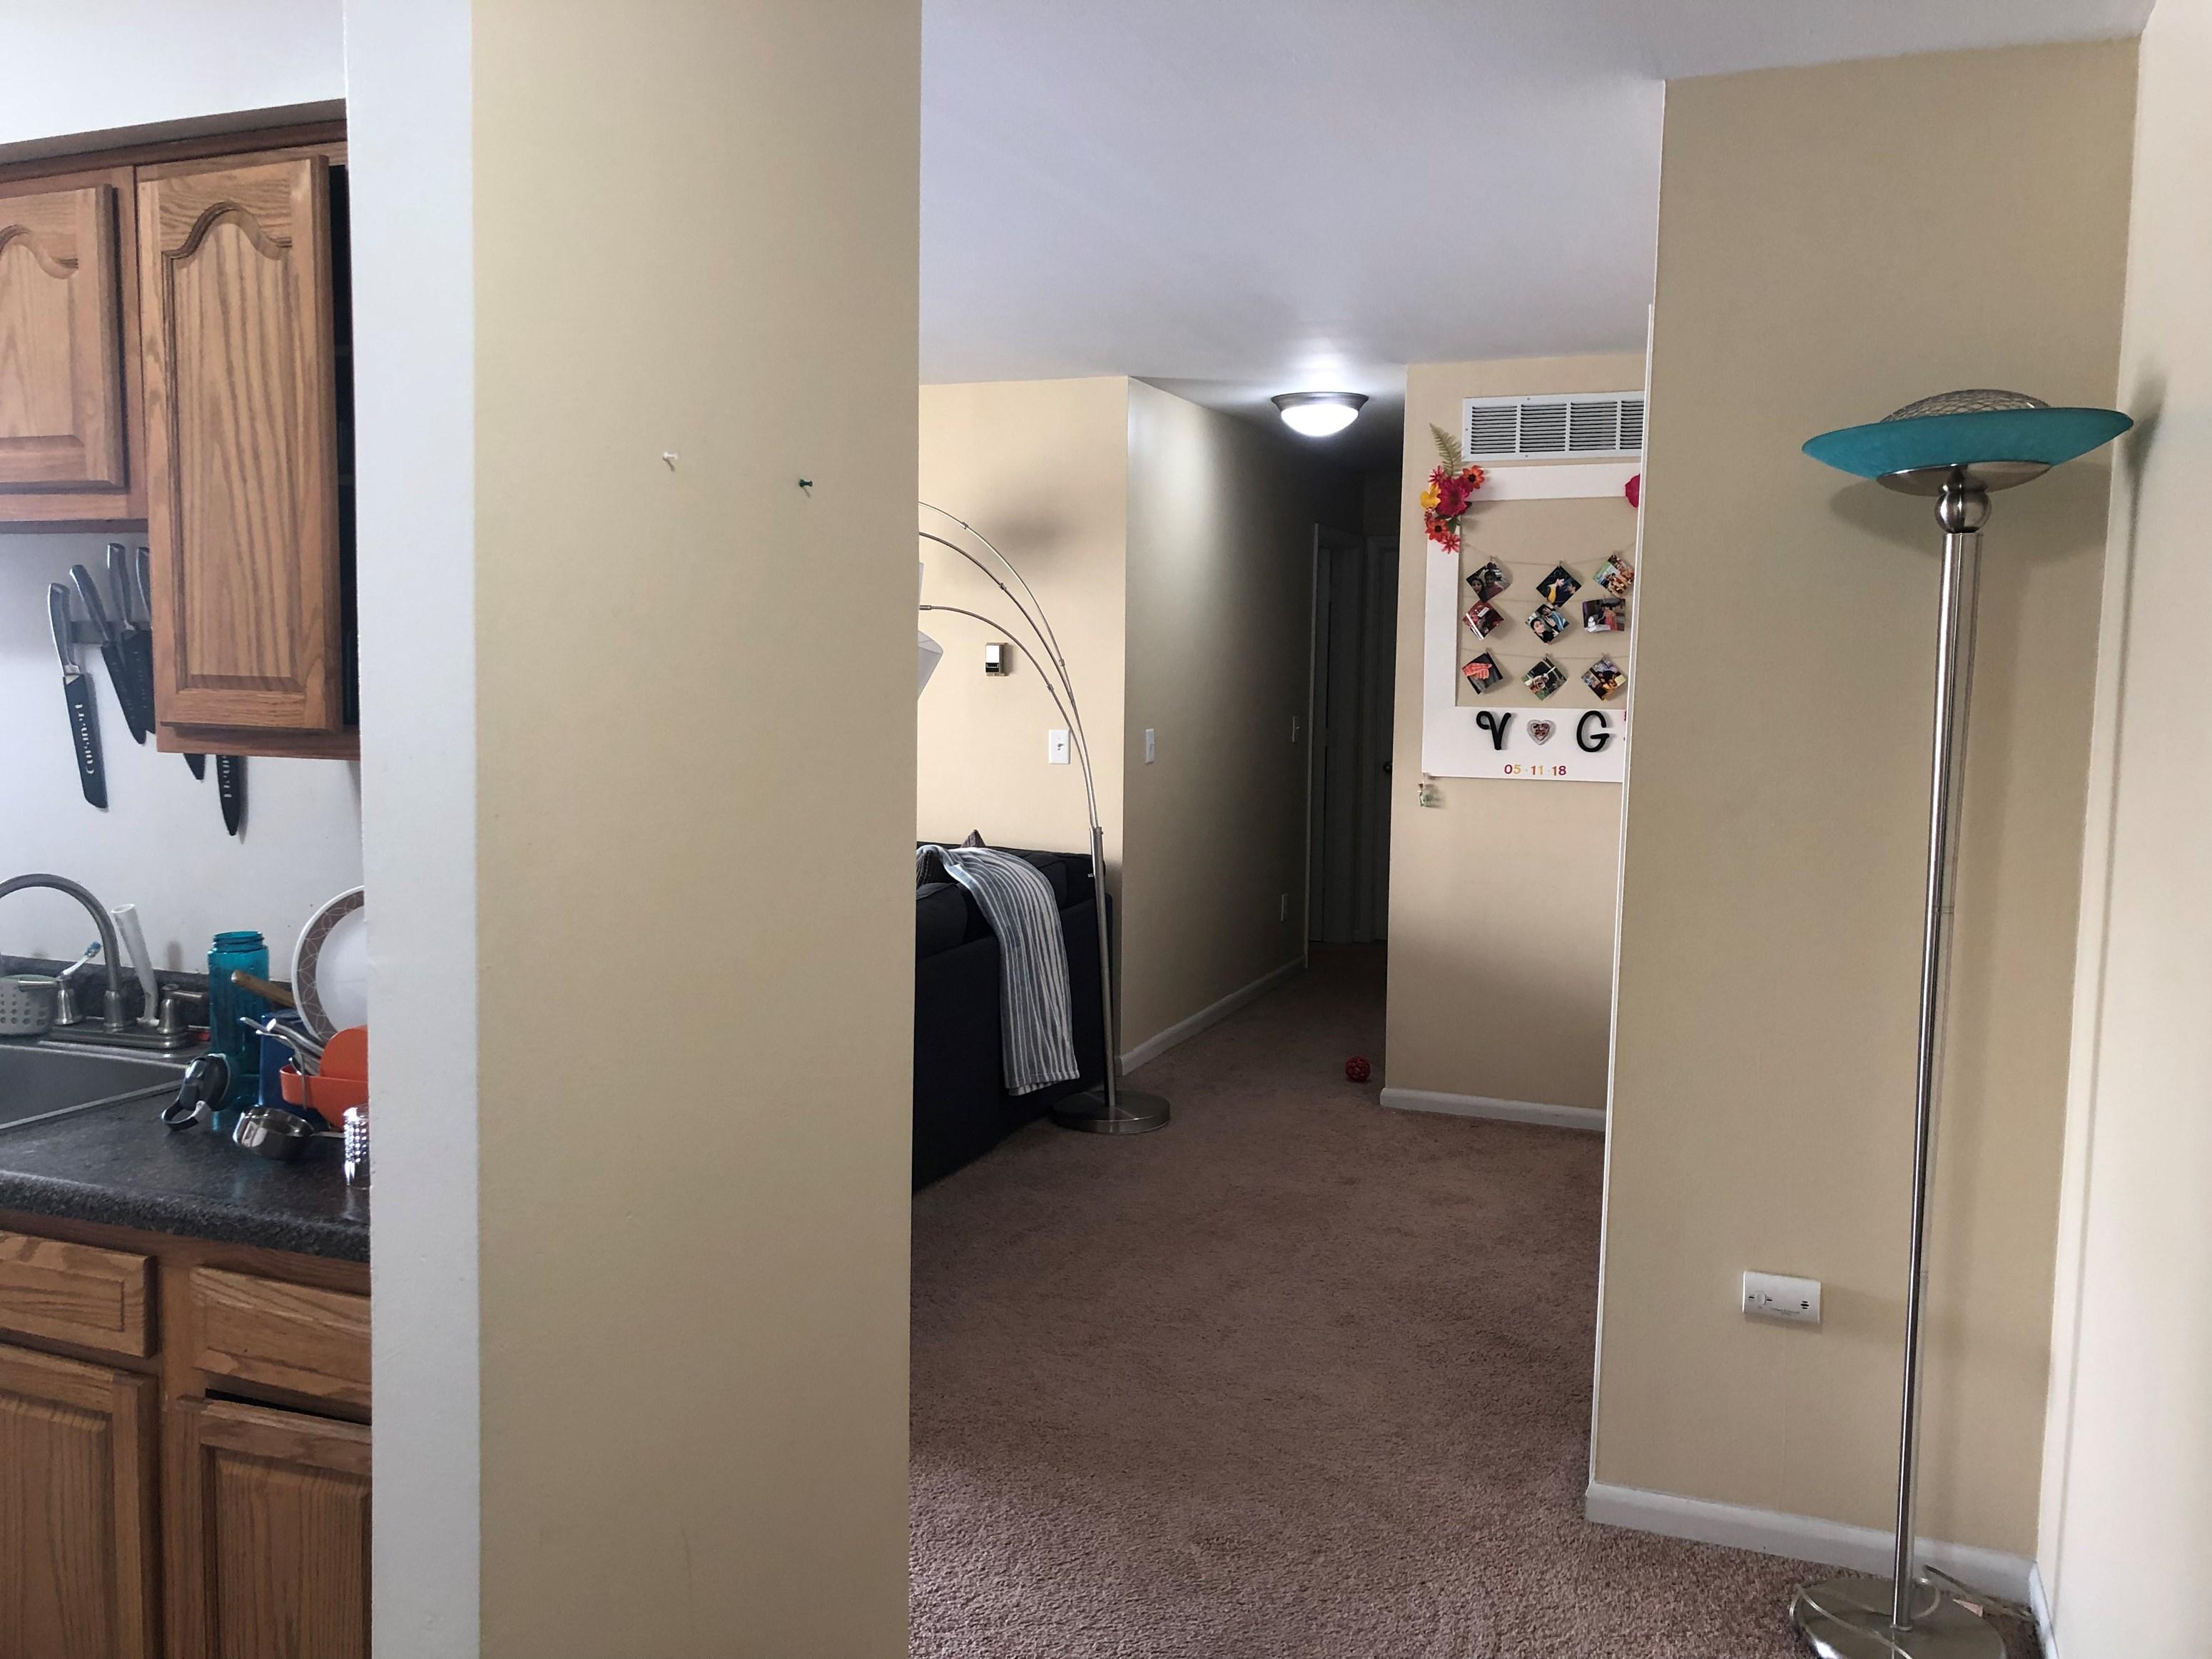 Apartmentflats For Rent In Detroit 1bhk 2bhk 3bhk 4bhk Rentals